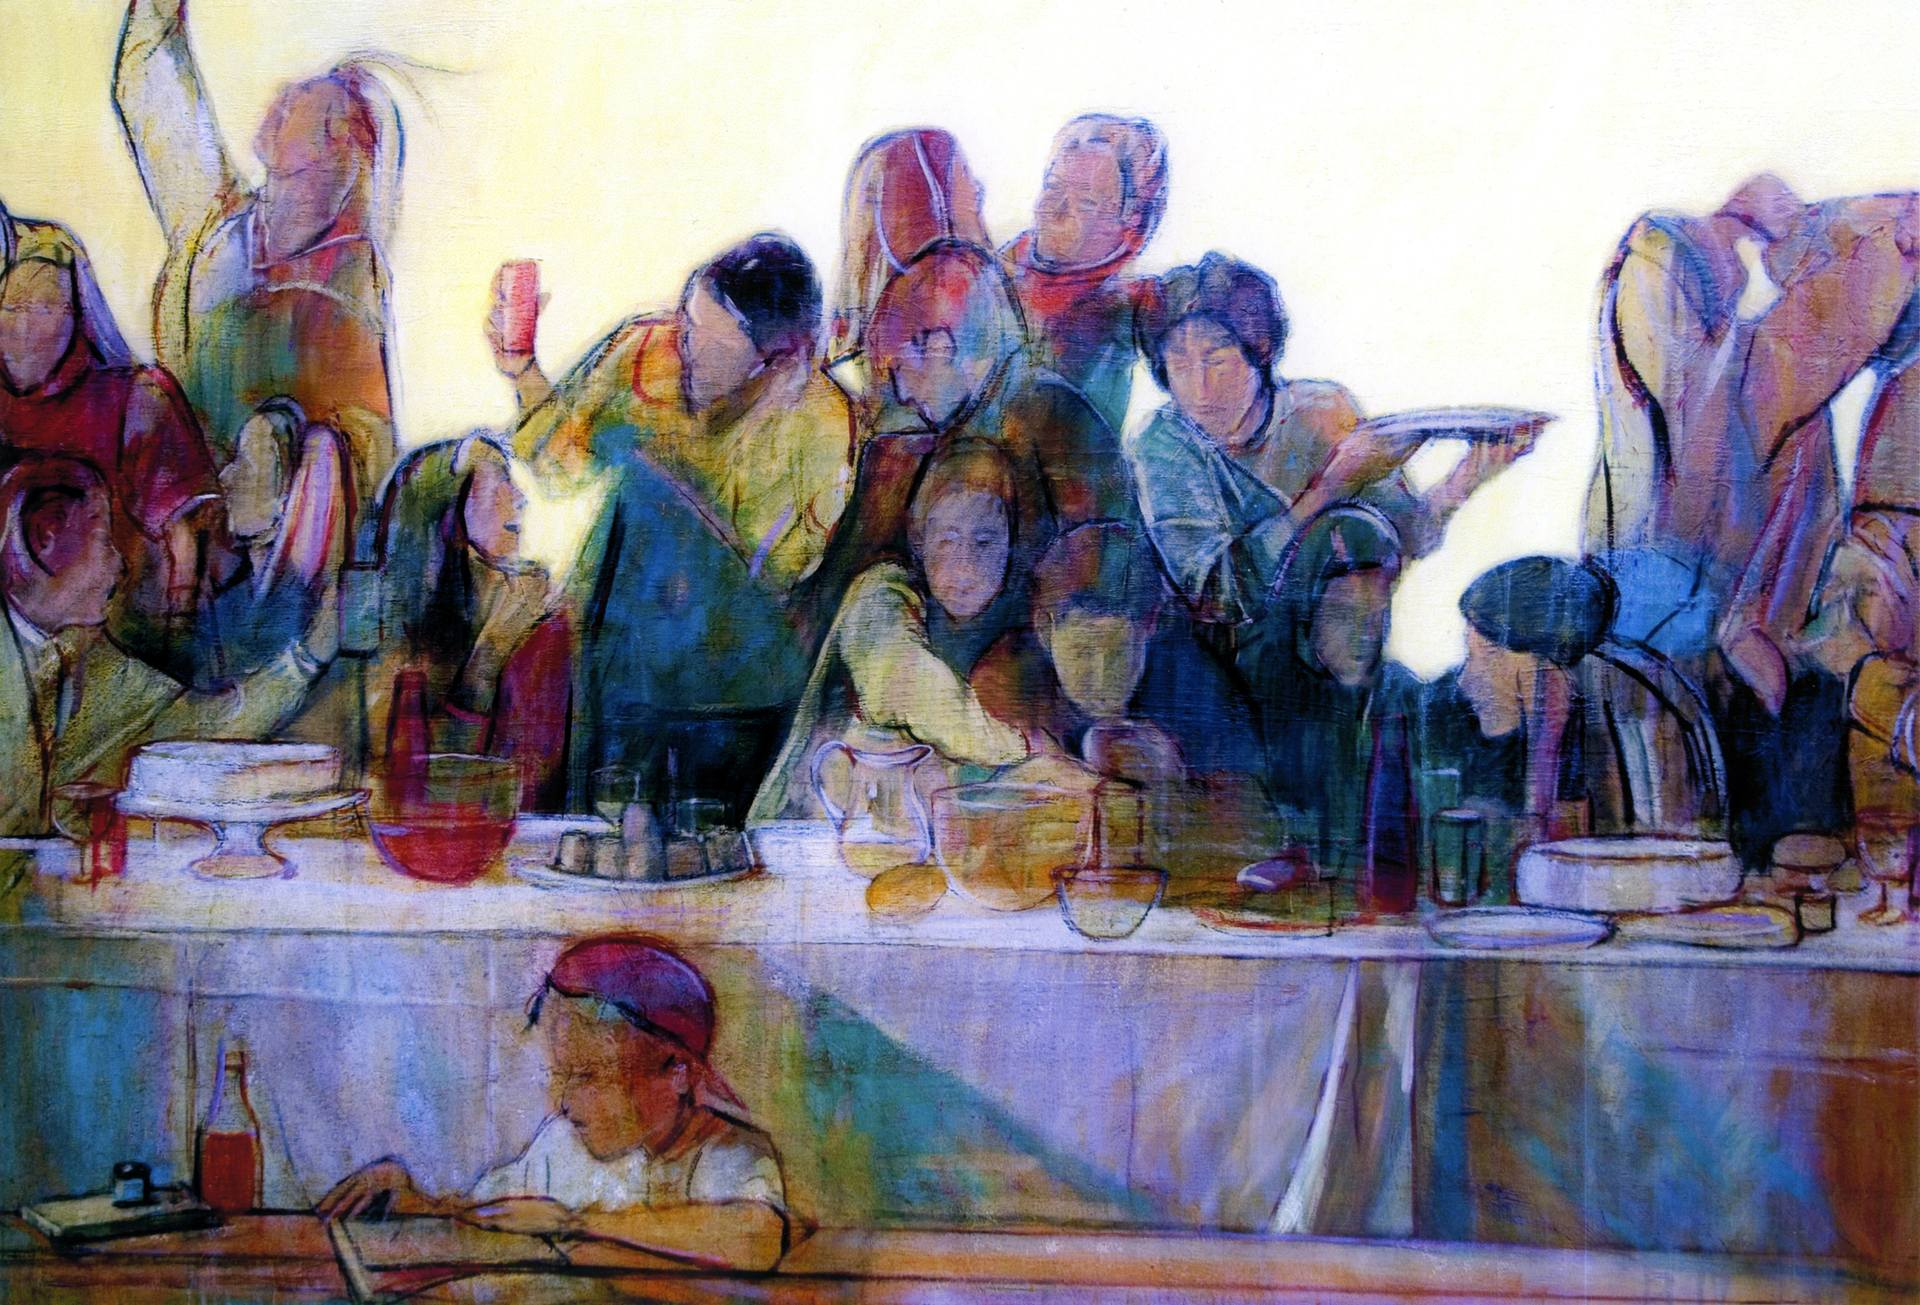 Saatchi Art Last Supper Painting By Philip Smeeton